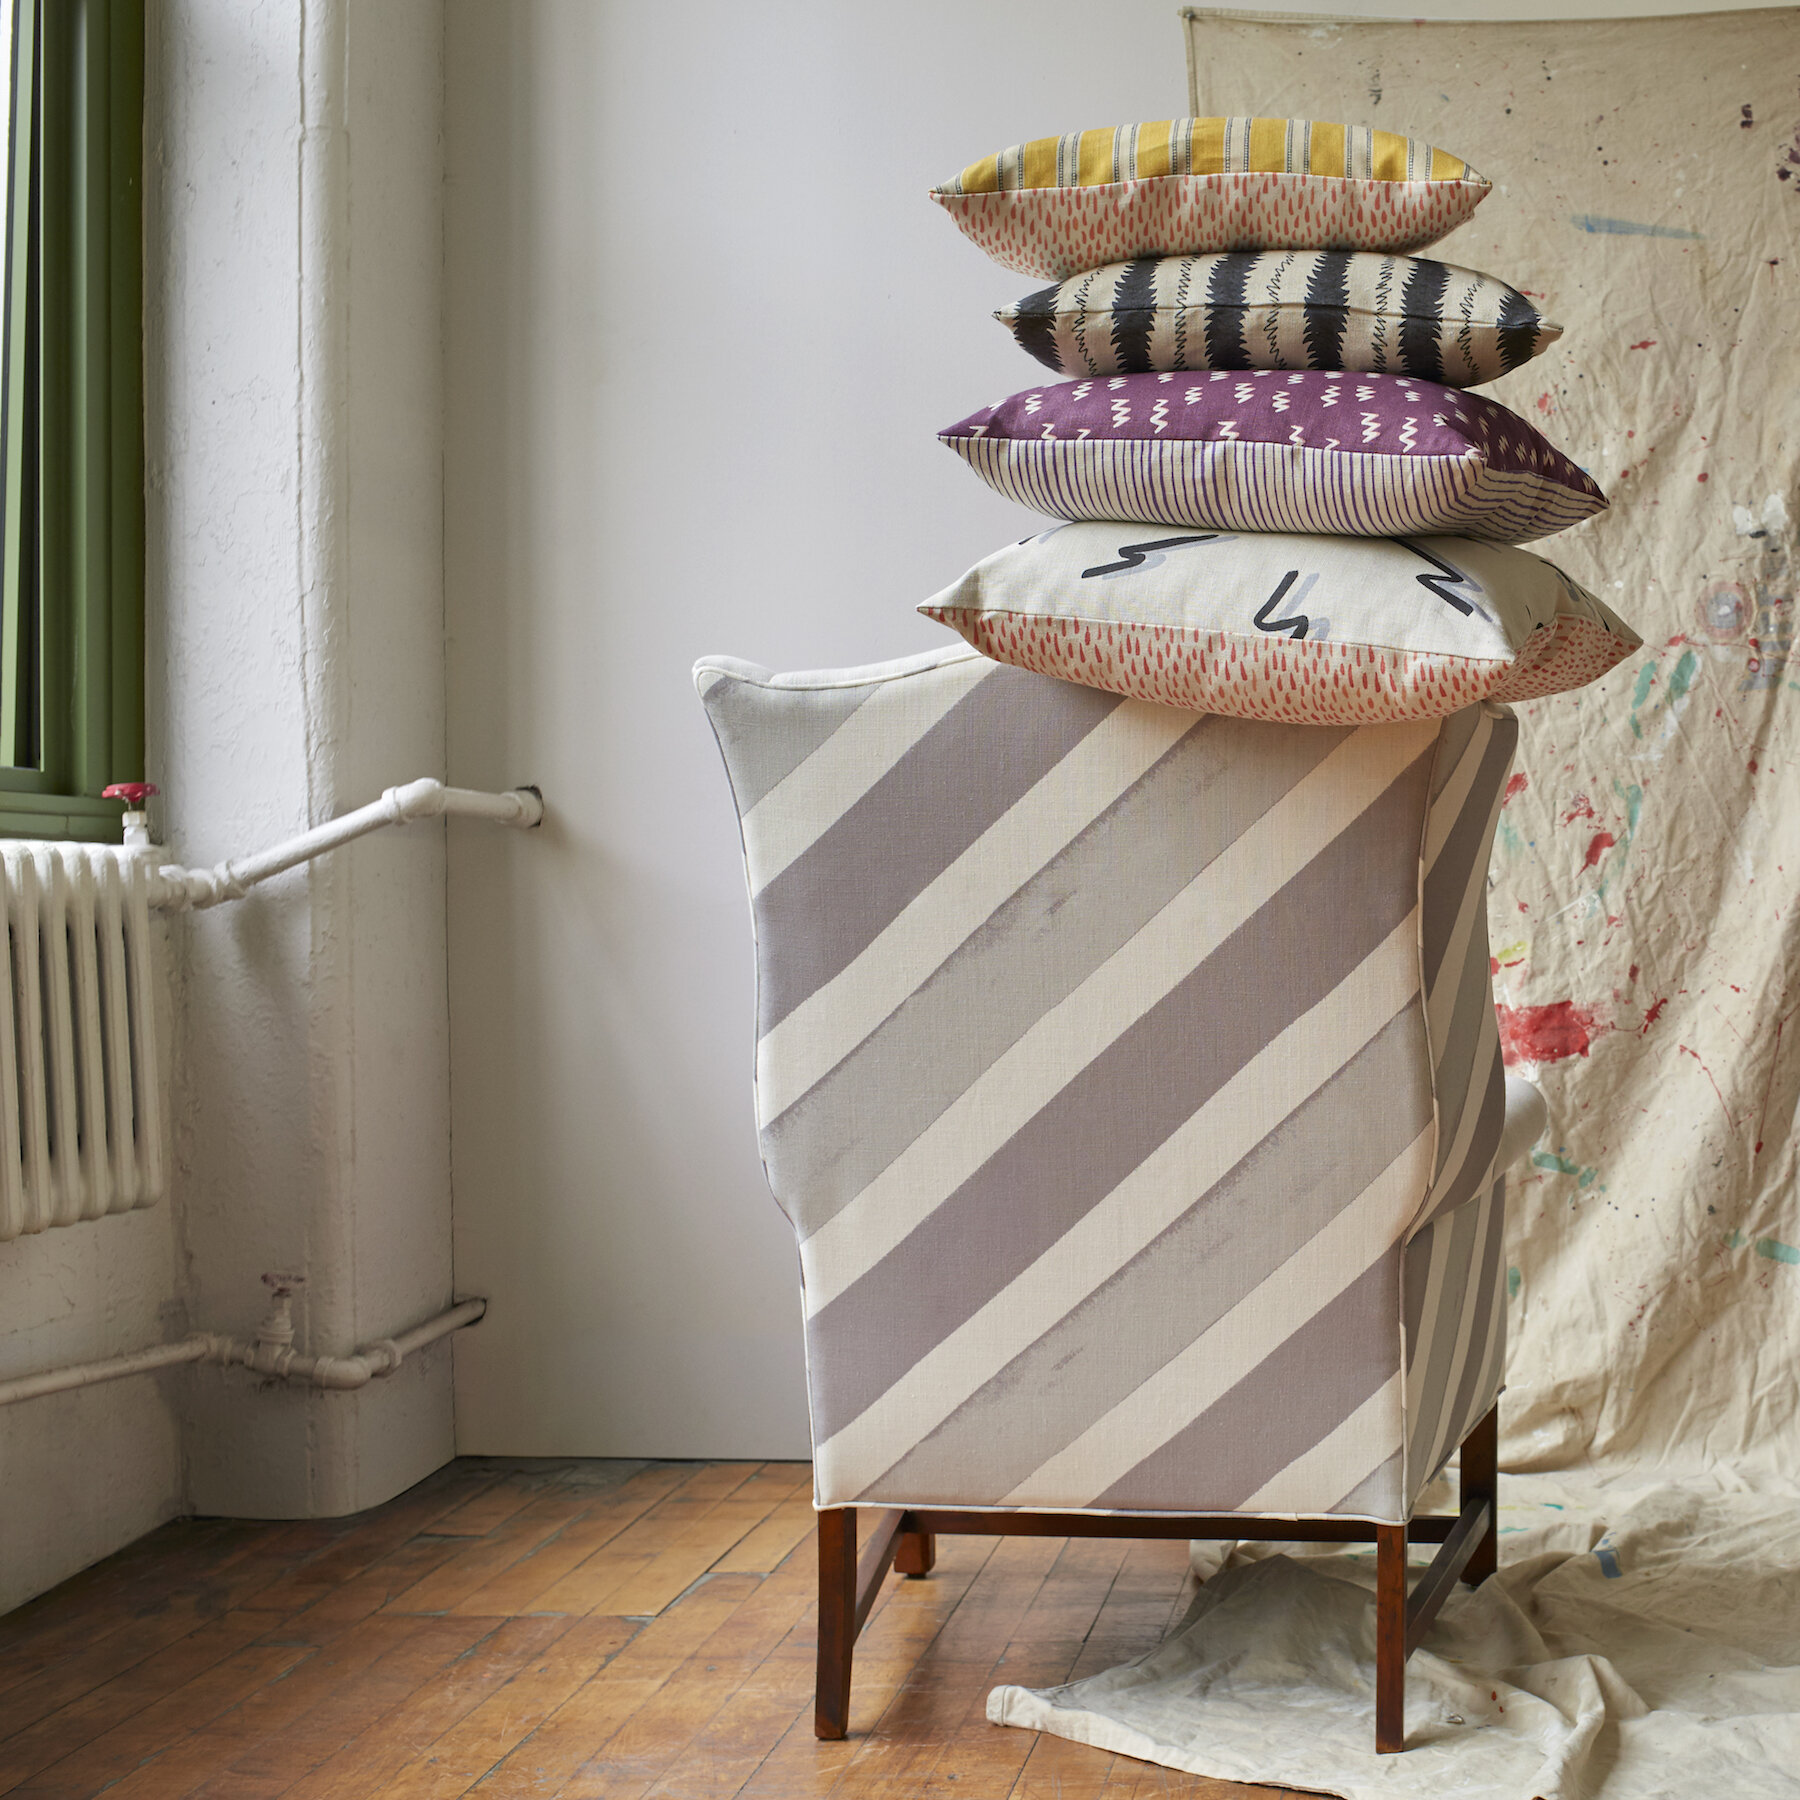 Upholstery fabrics by KLS Textiles